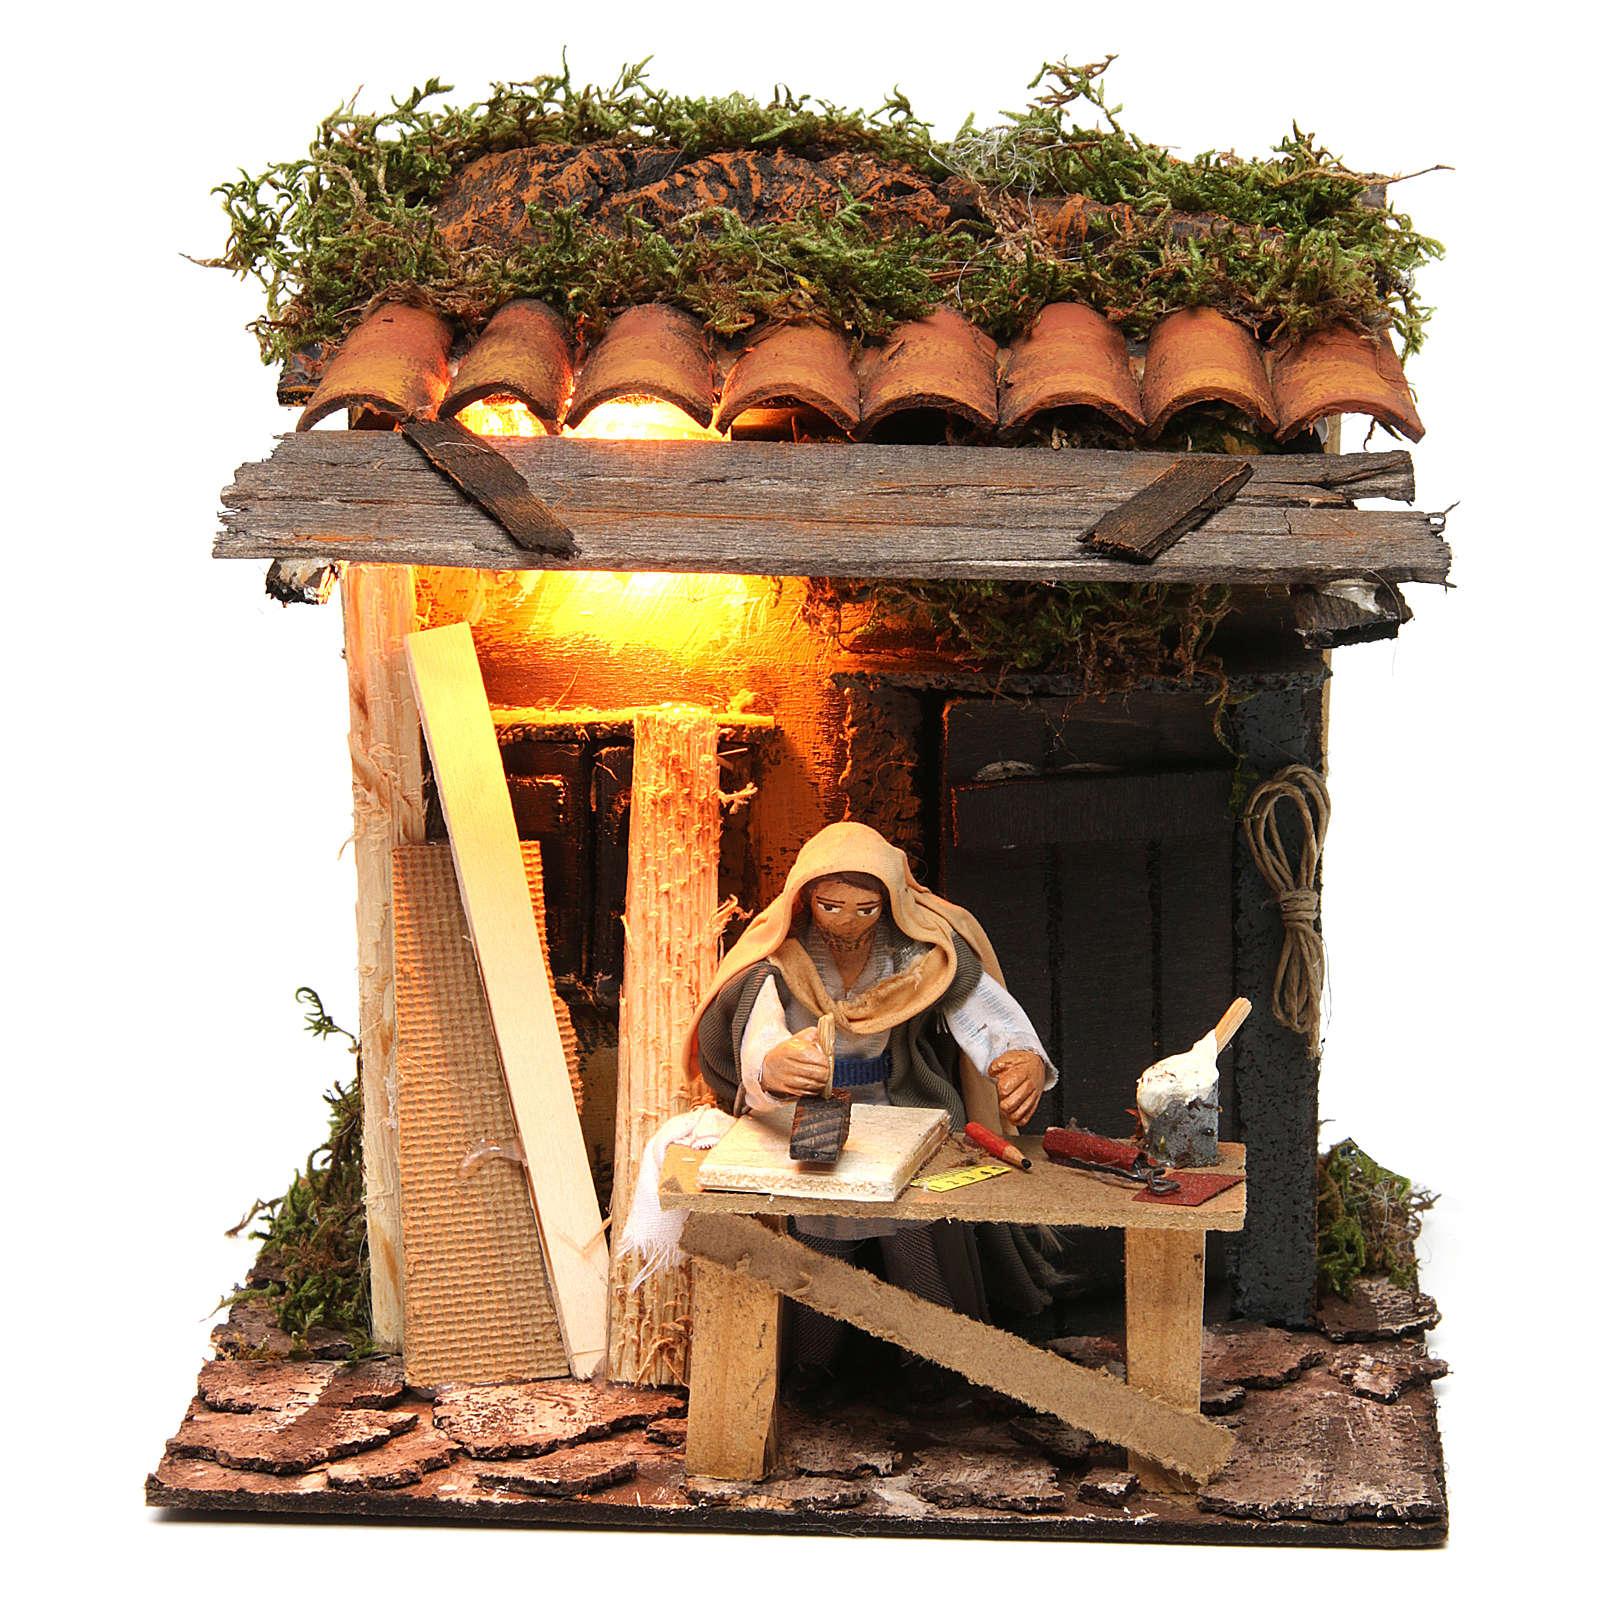 Animated Neapolitan nativity figurine, carpenter 10cm 4